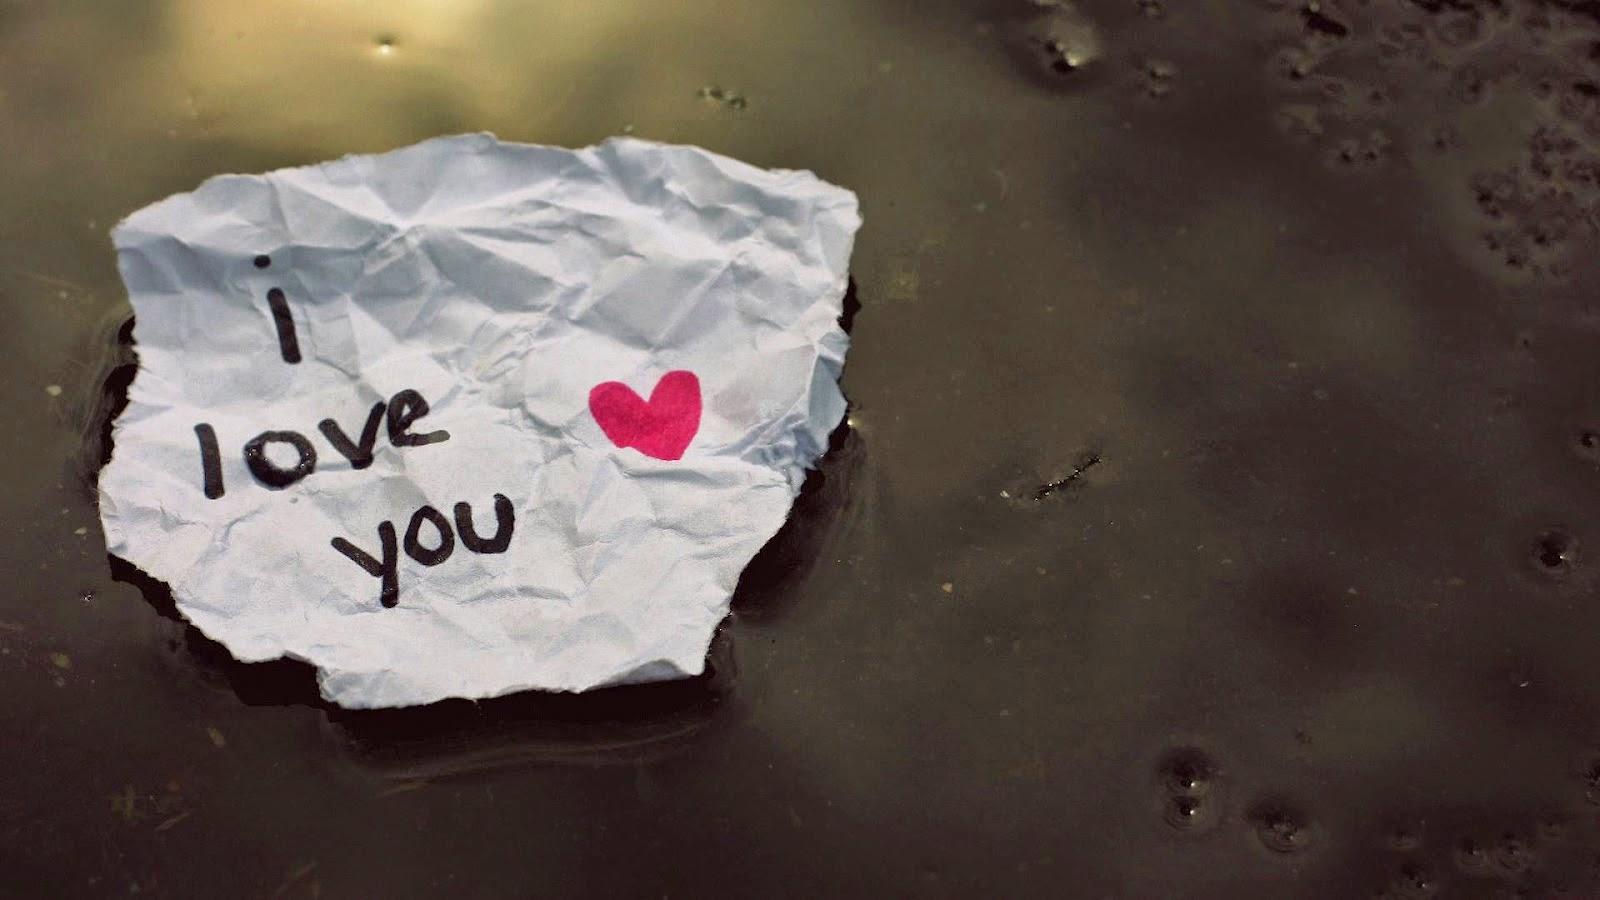 Image of: Sweet Love You Wallpaper Love Note Brand Thunder 15 New Valentines Day Desktop Wallpapers For 2015 Brand Thunder